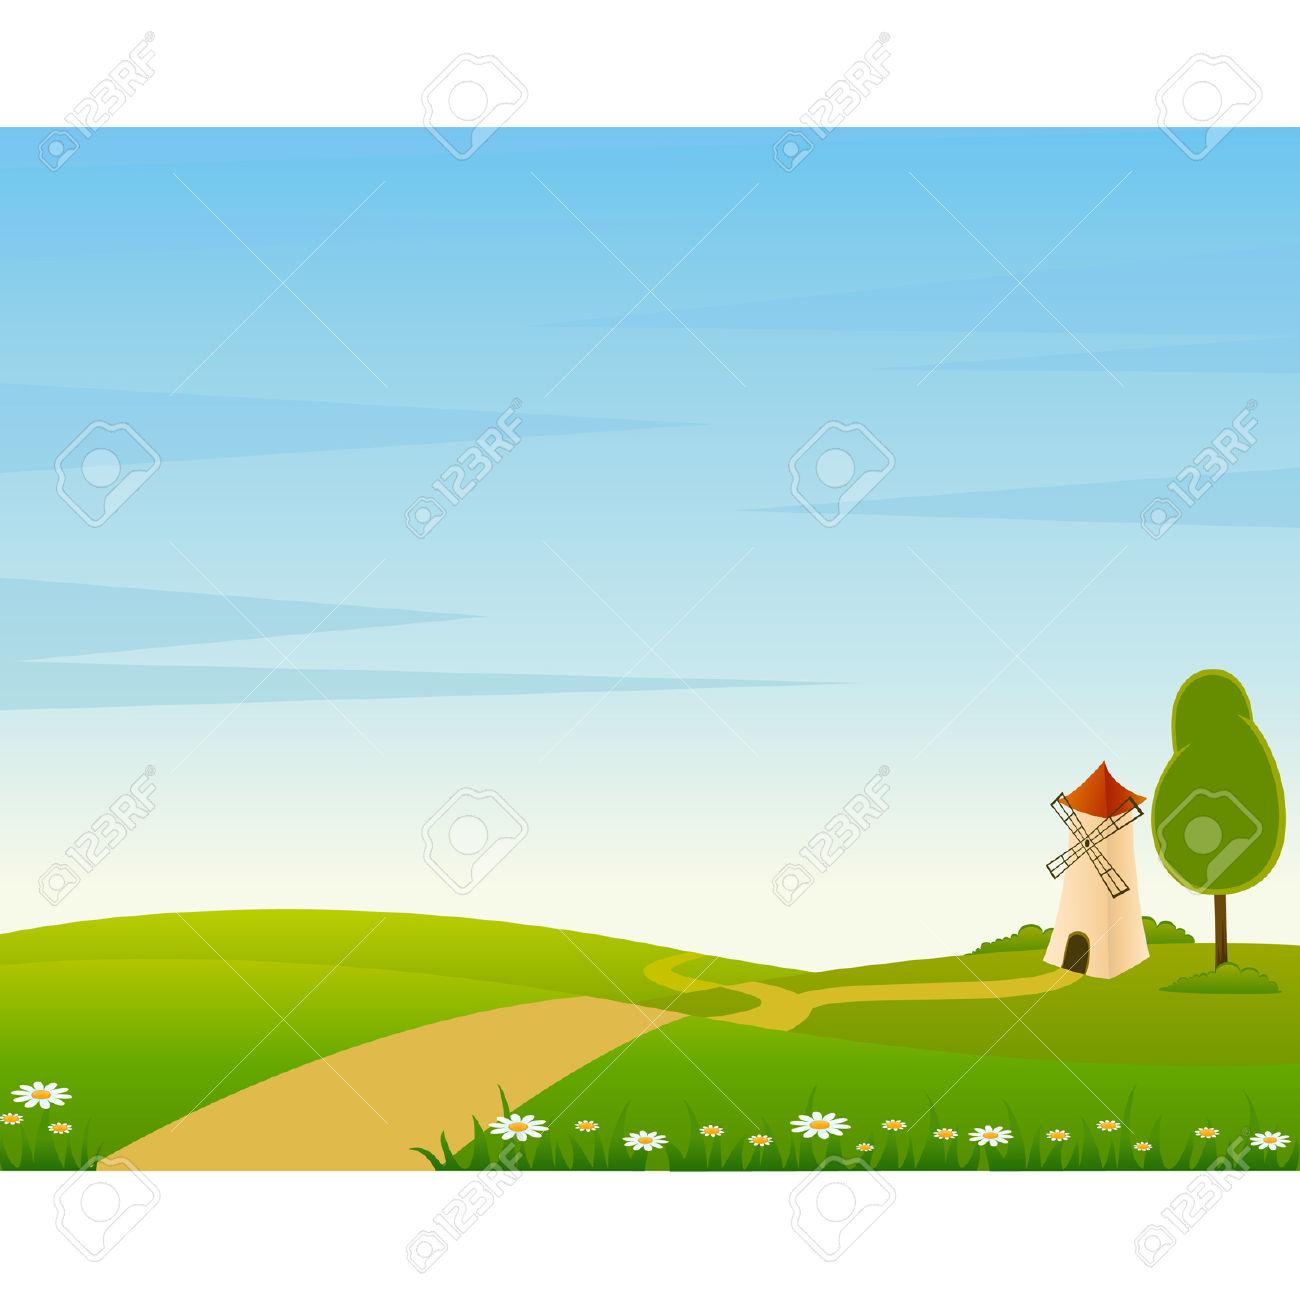 Landscape clipart #7, Download drawings